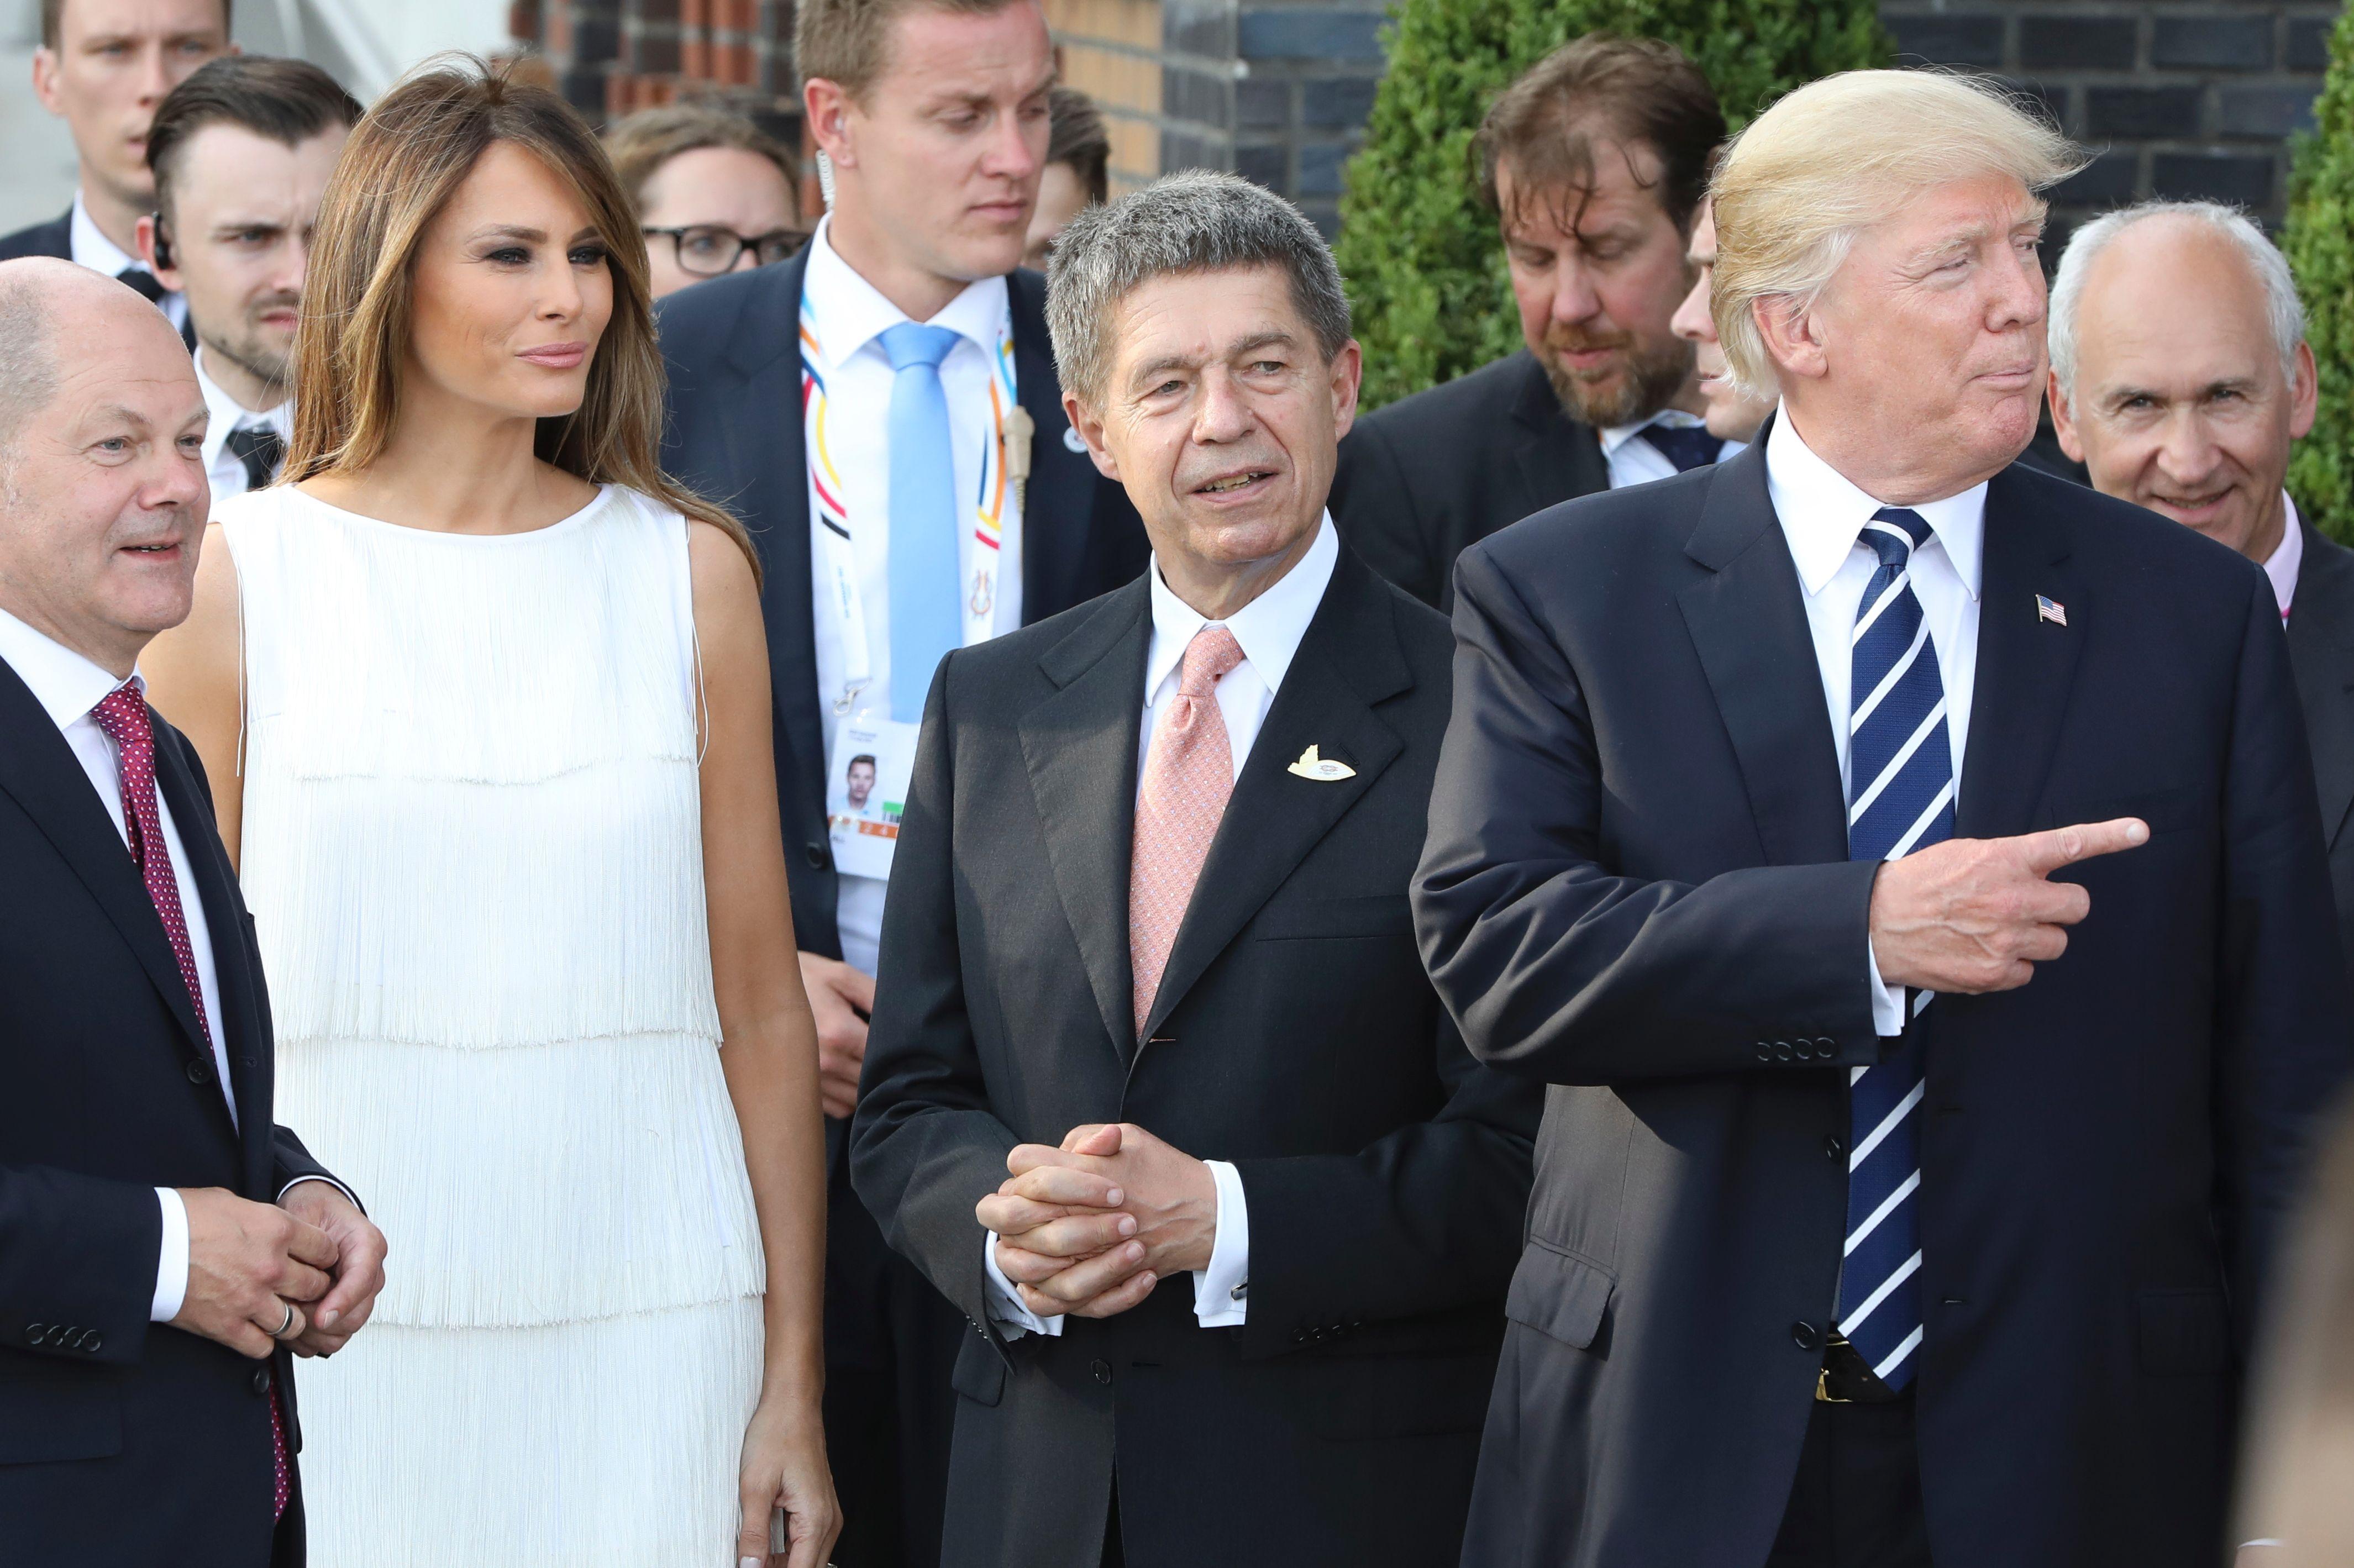 GERMANY-G20-SUMMIT-CONCERT